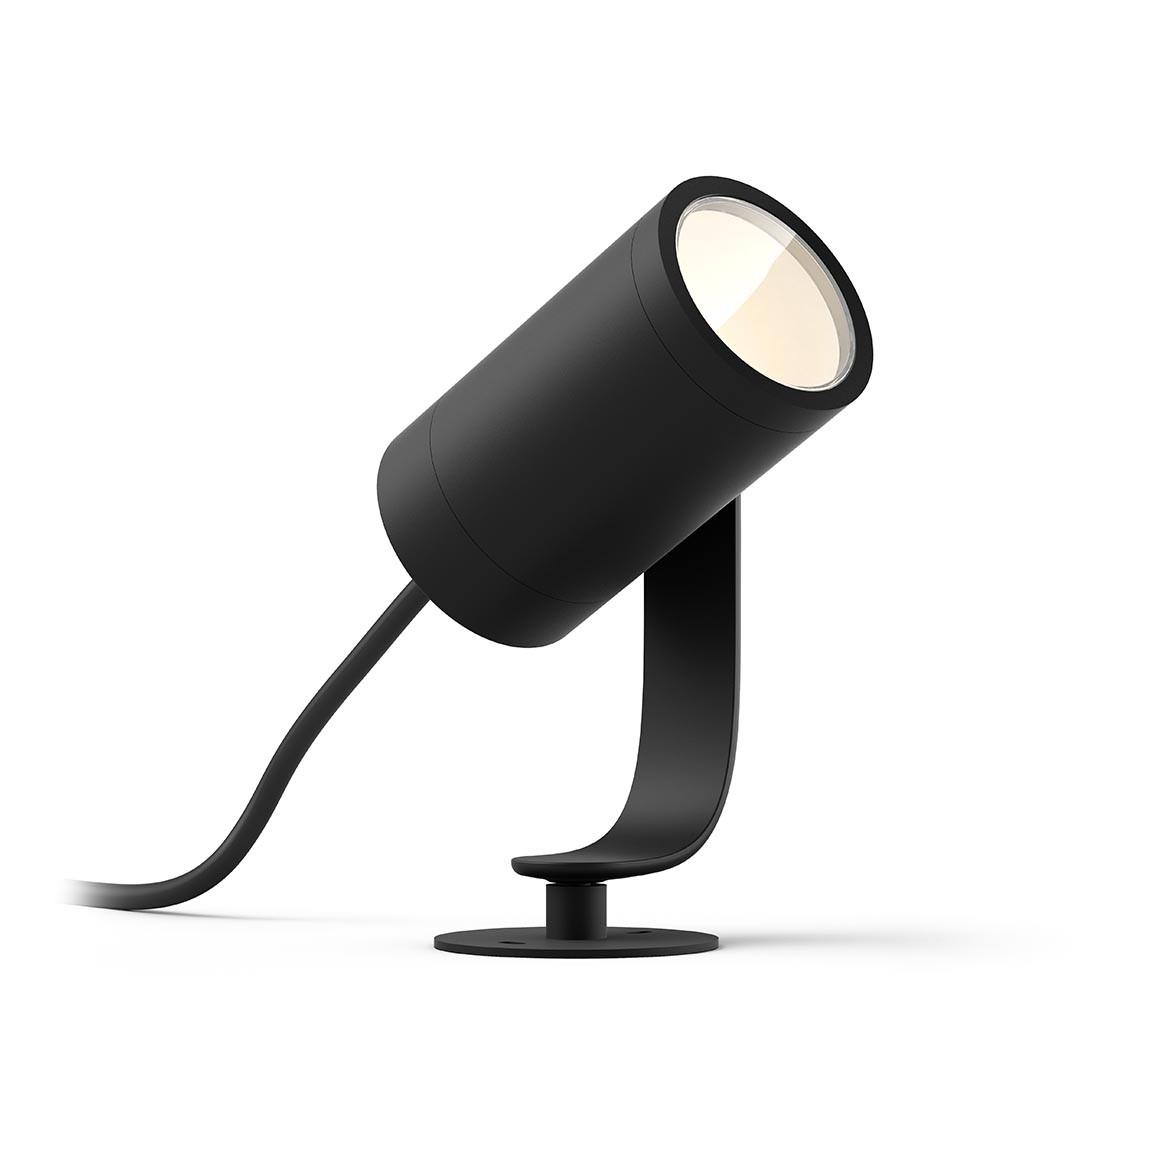 Philips Hue LED Spot Lily 1flg. 640lm Erweiterung - Schwarz